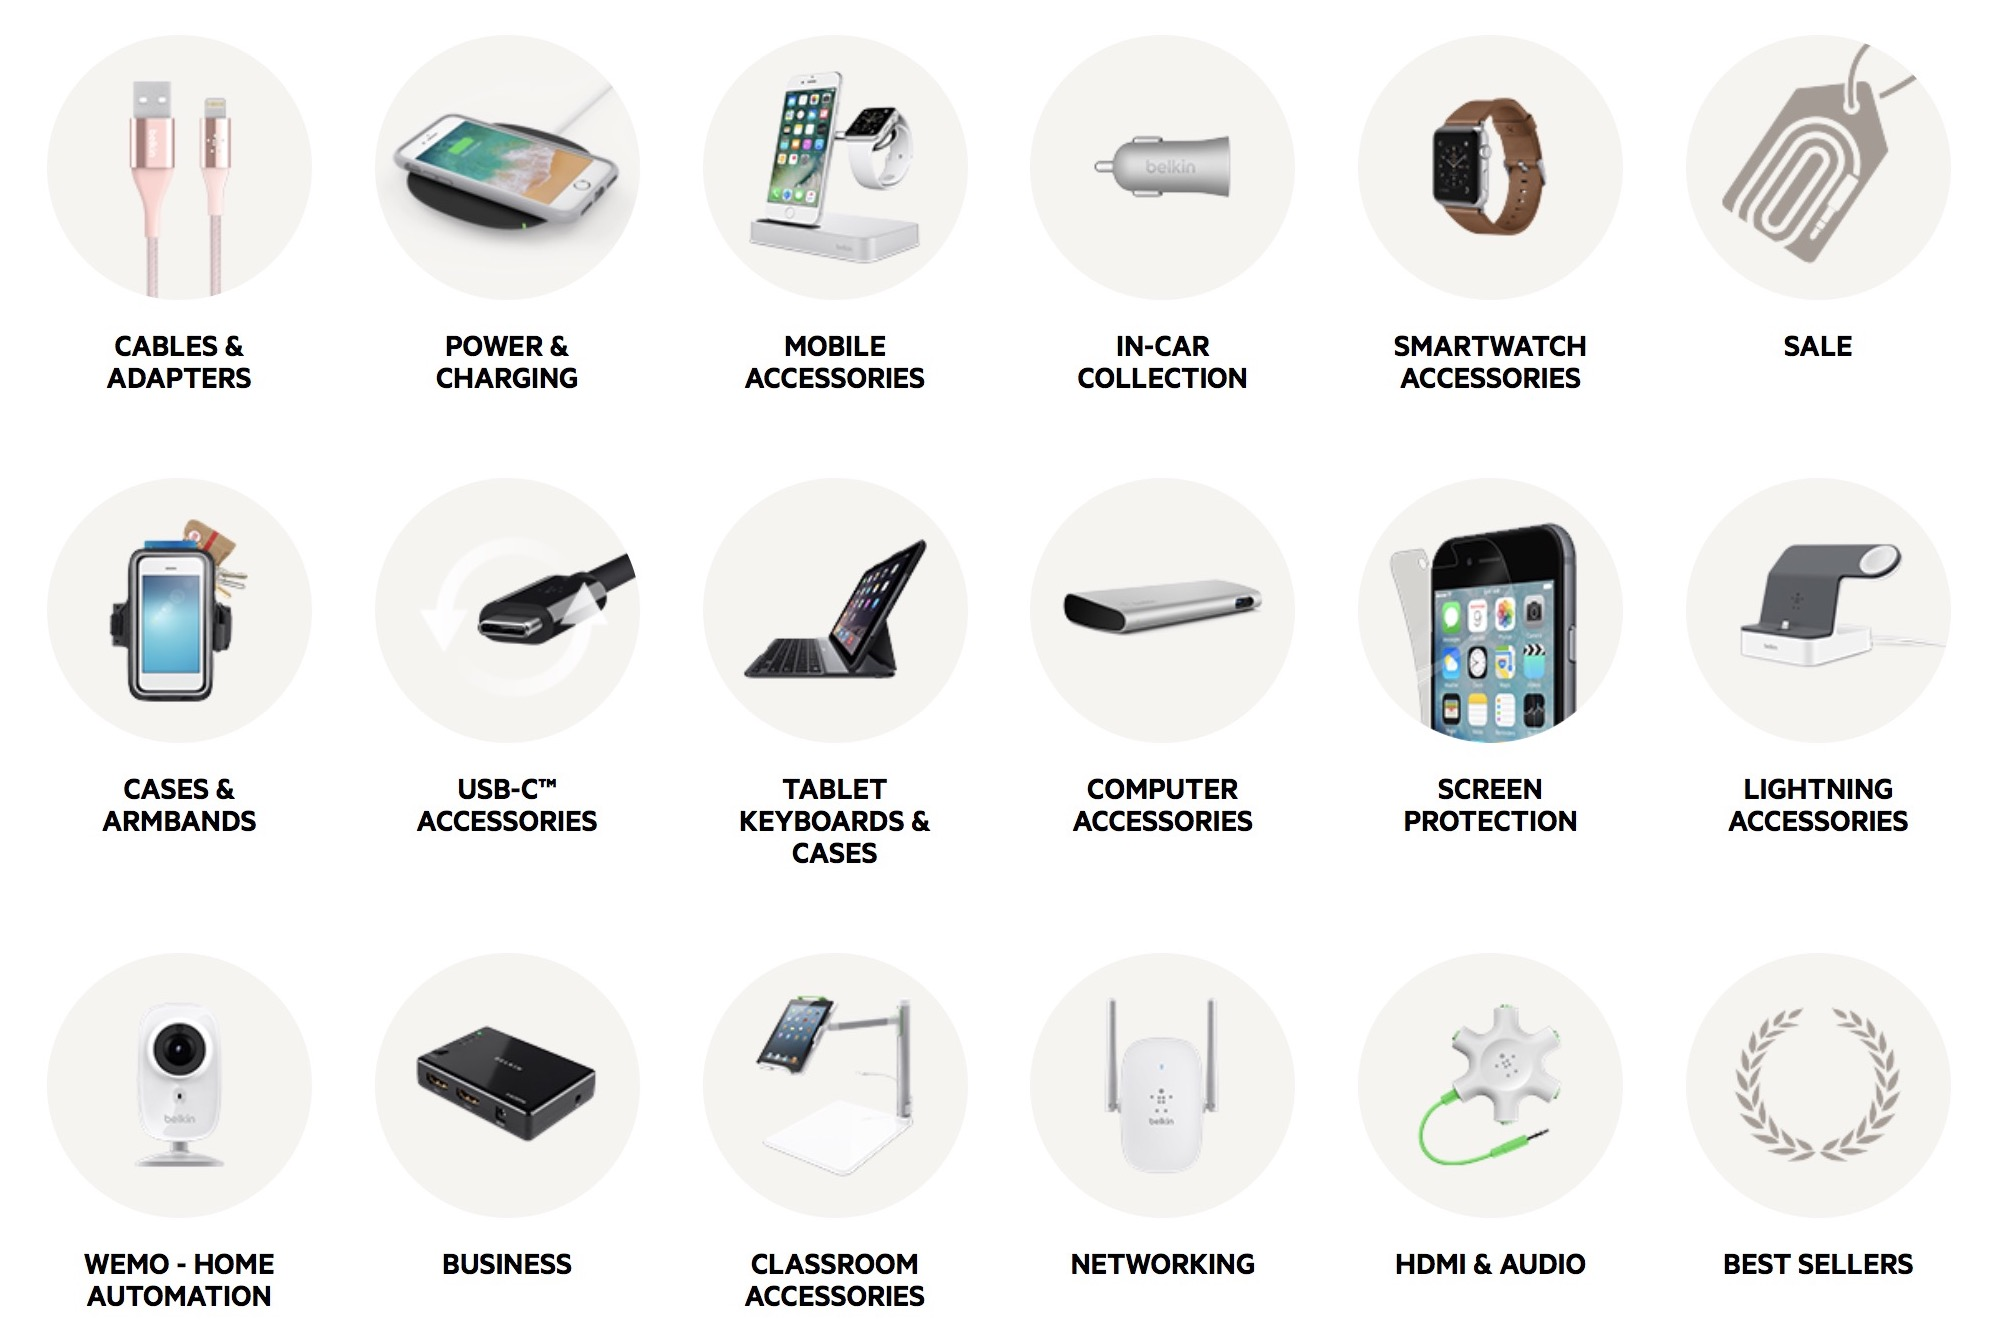 Belkin accessories